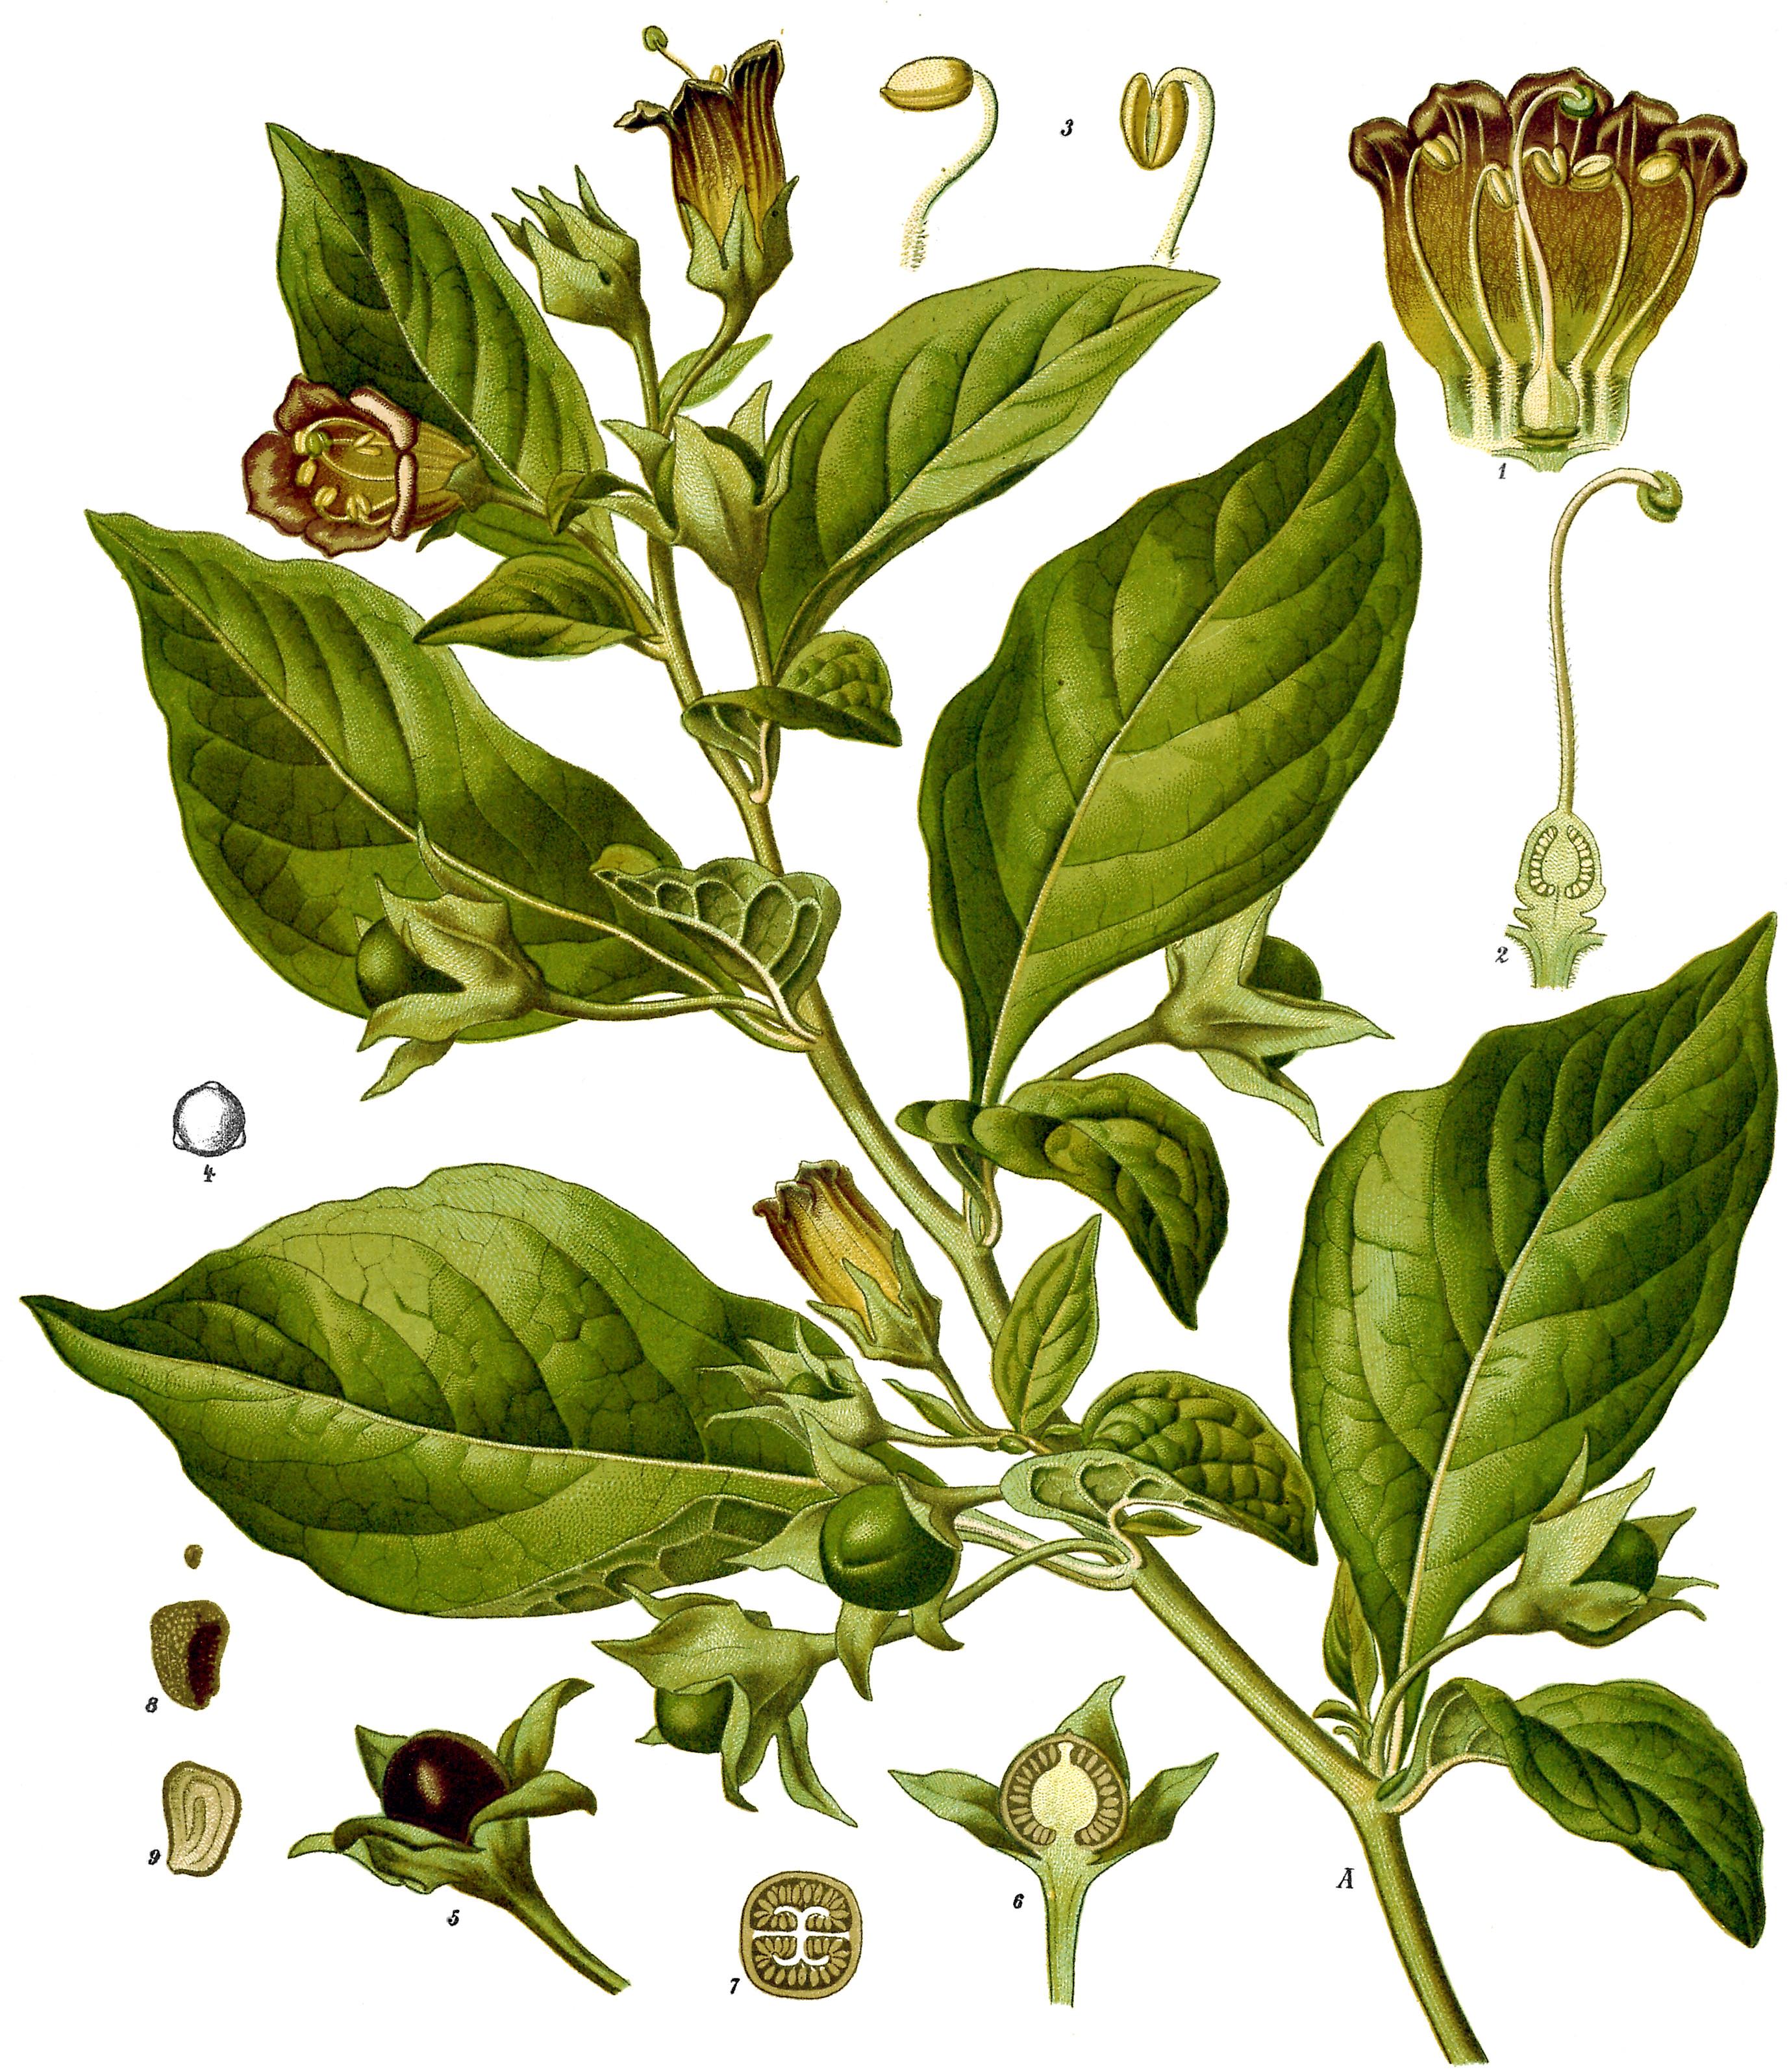 Belladona image